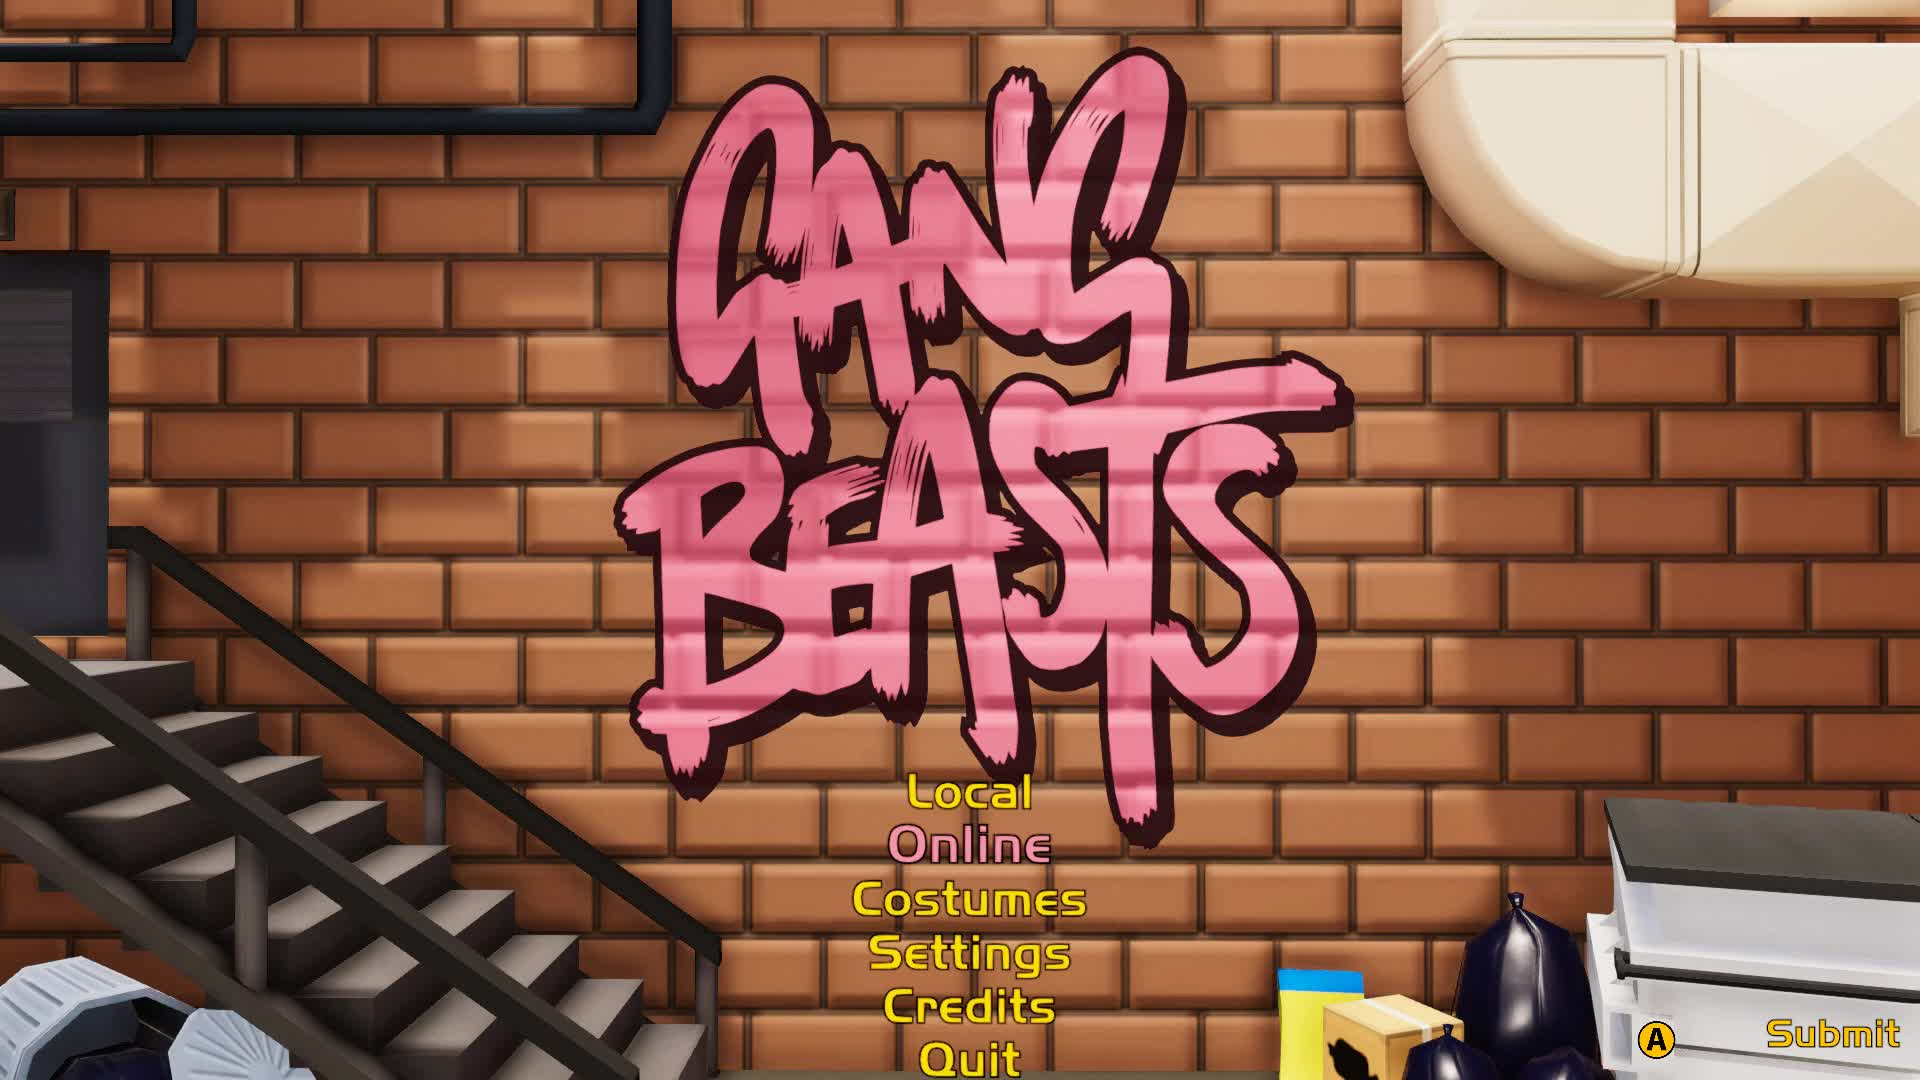 gangbeasts, vlc-record-2018-02-17-20h41m34s-Gang Beasts 02.17.2018 - 19.38.09.03.DVR.mp4- GIFs